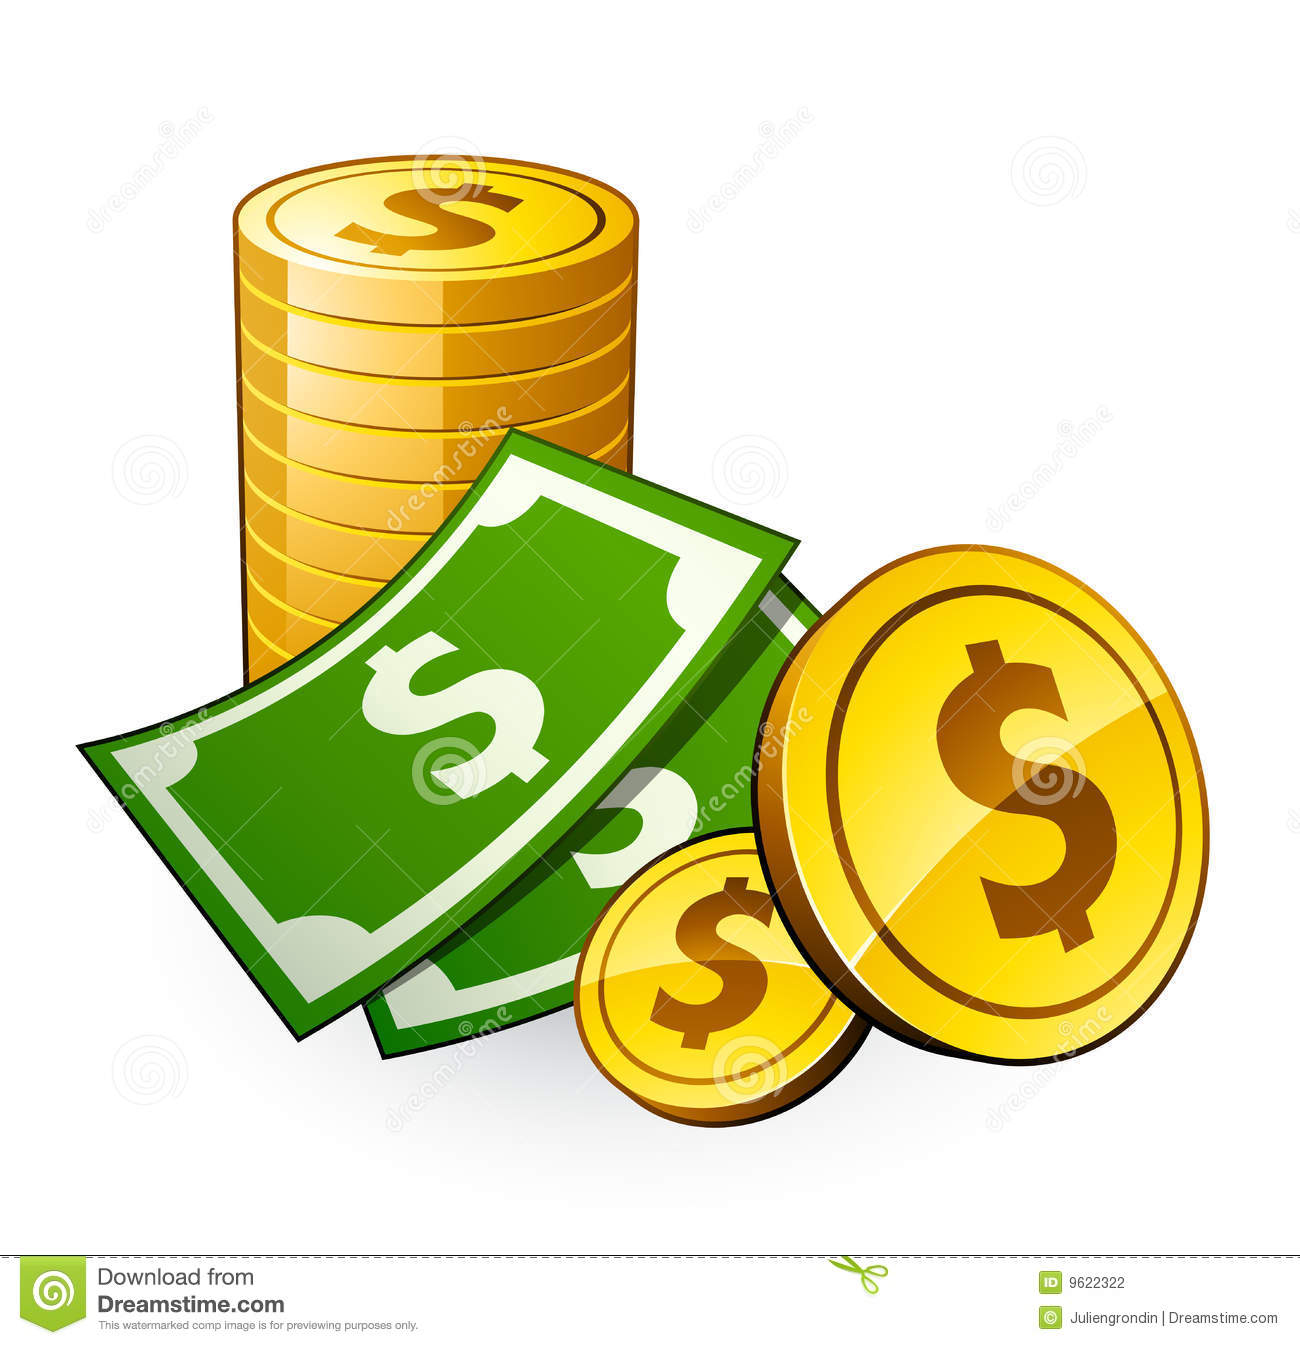 Cash for gold clipart transparent download Gold Coin Clipart | Free download best Gold Coin Clipart on ... transparent download